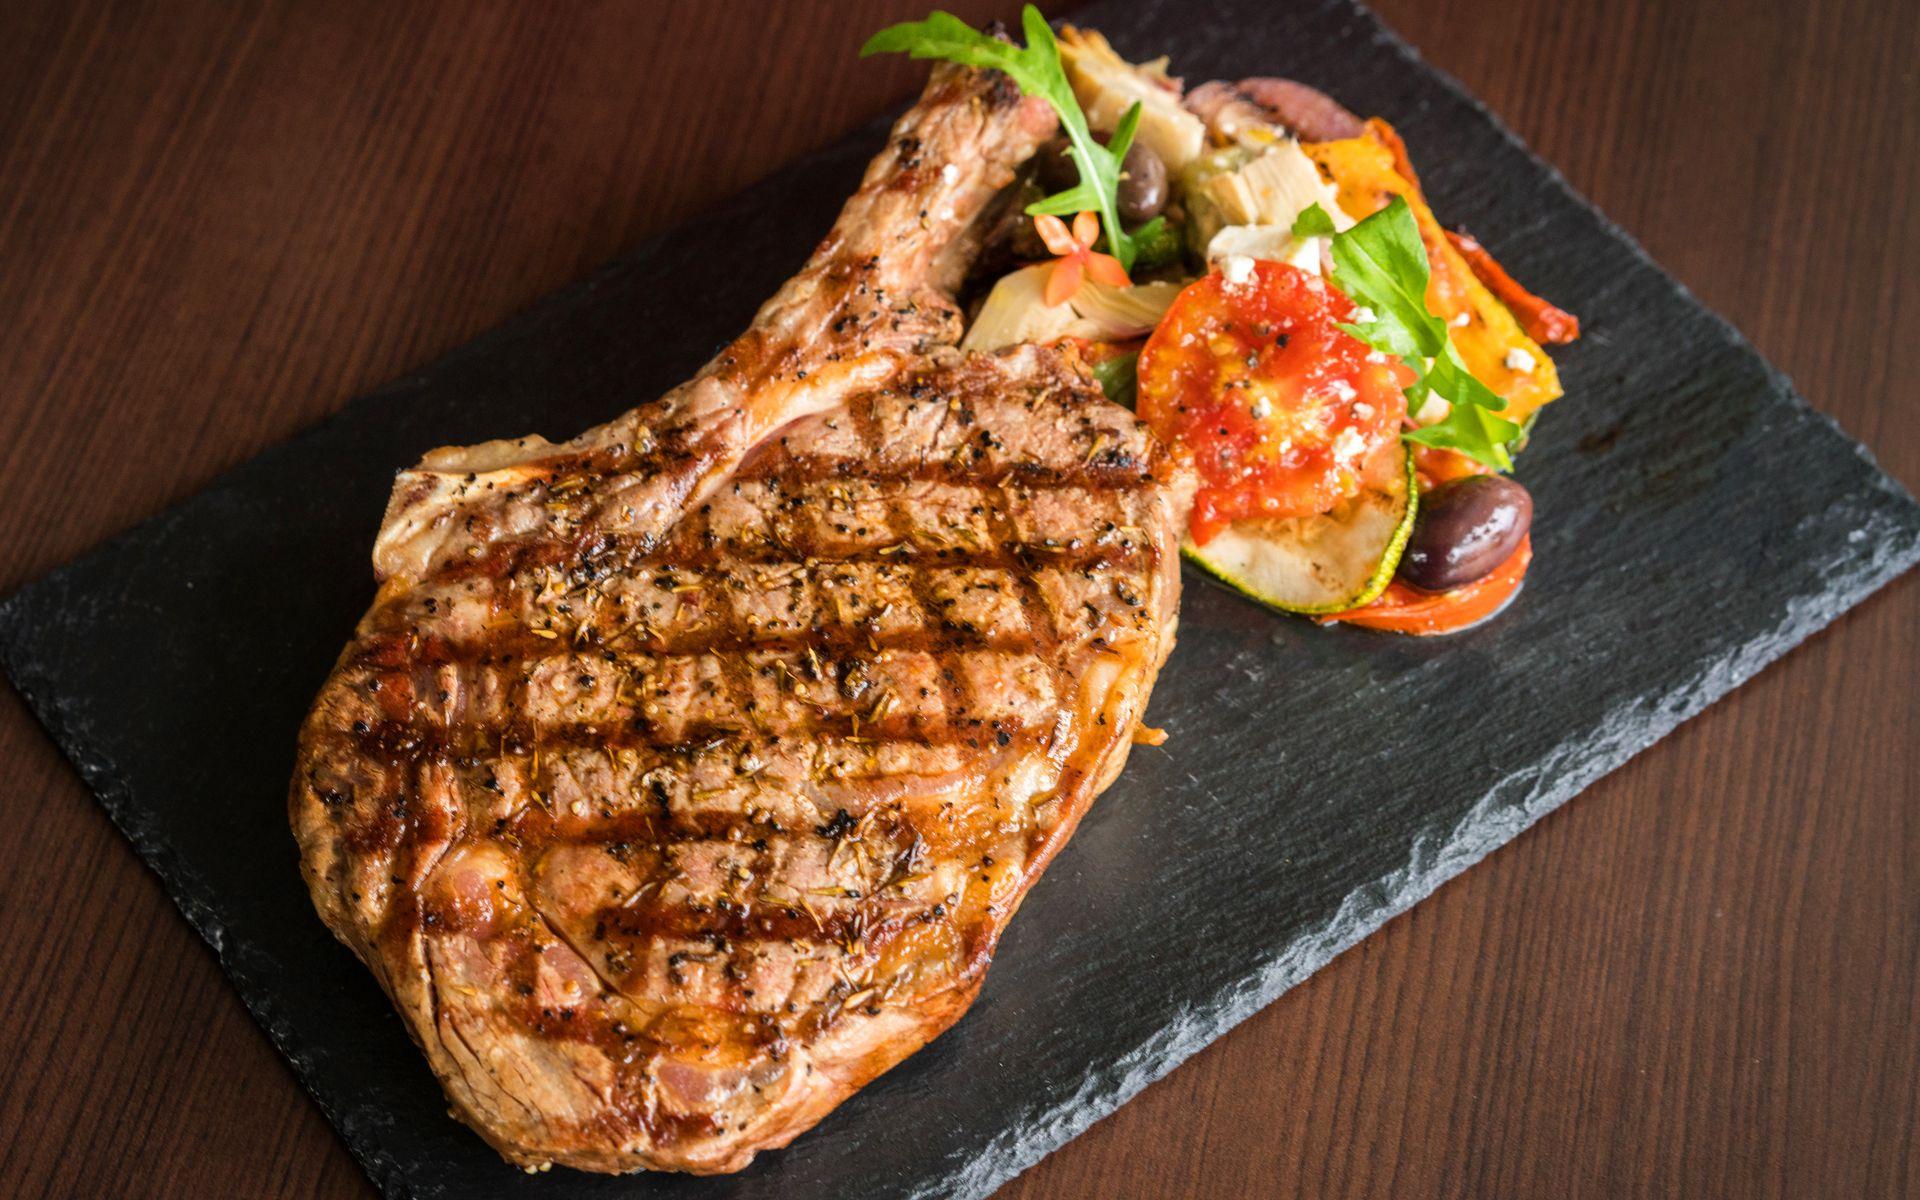 Steak Your Meals With Fiorentina At Acqua